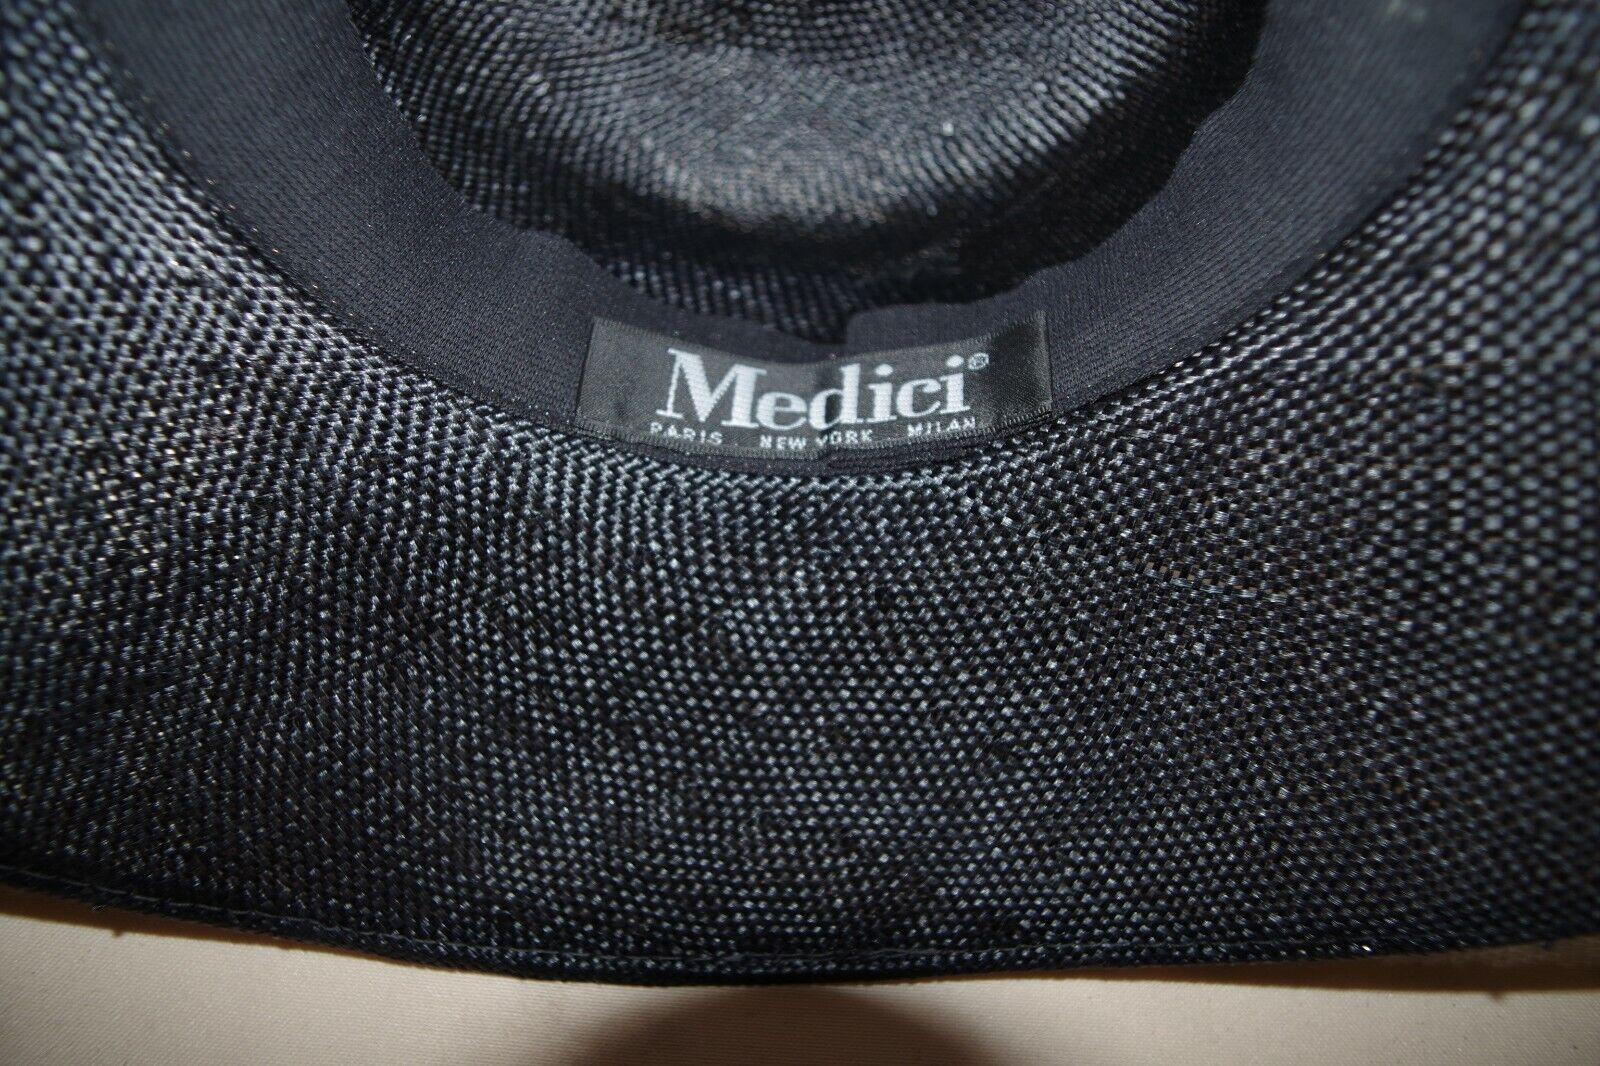 MEDICI WIDE BRIM STRAW HAT WIDE BRIM BLACK & TAN … - image 9